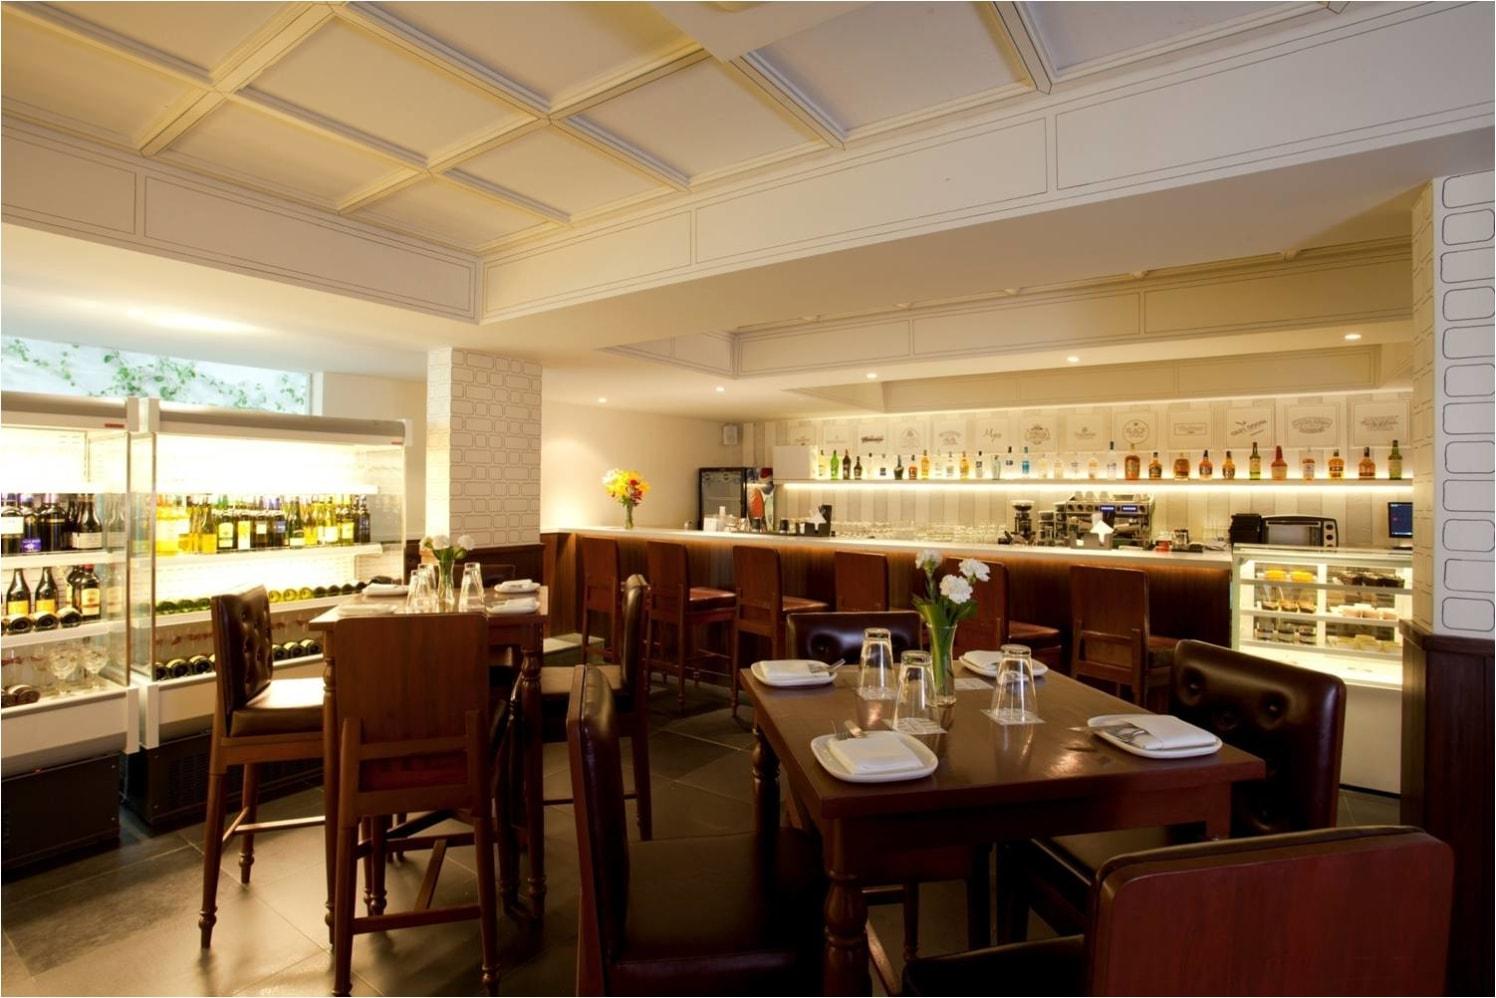 A Beautiful Bar cum Restaurant! by Red Touch Interior & Retail Designers Modern | Interior Design Photos & Ideas